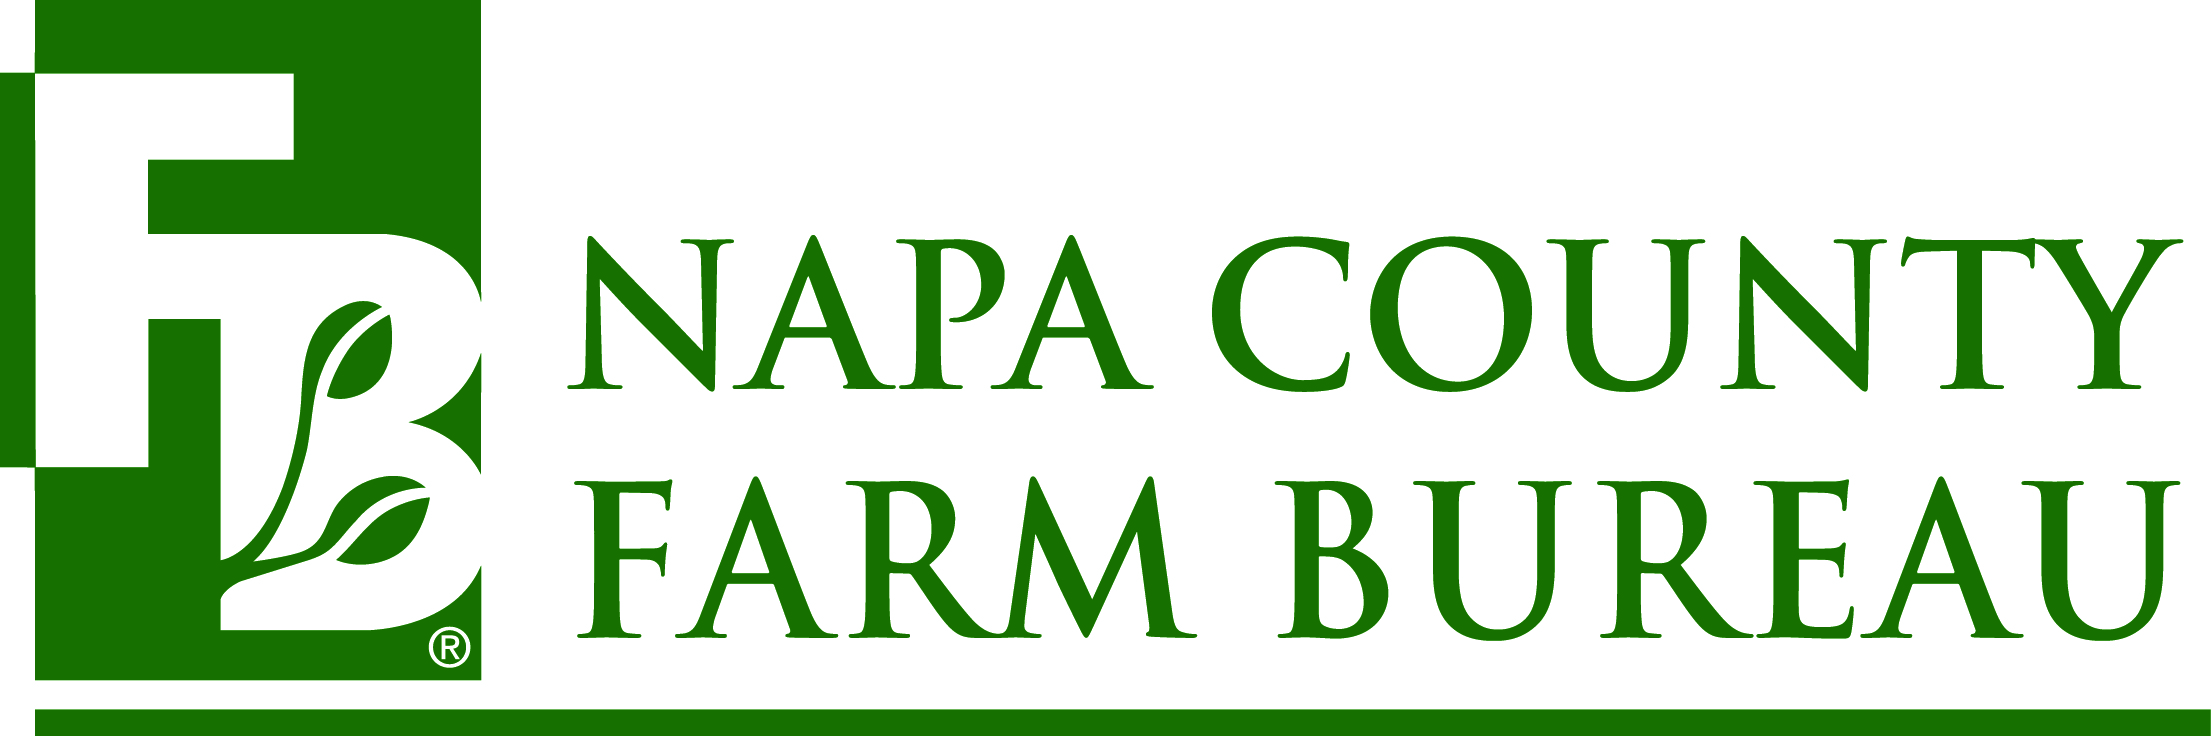 Napa County Farm Bureau Logo.jpg